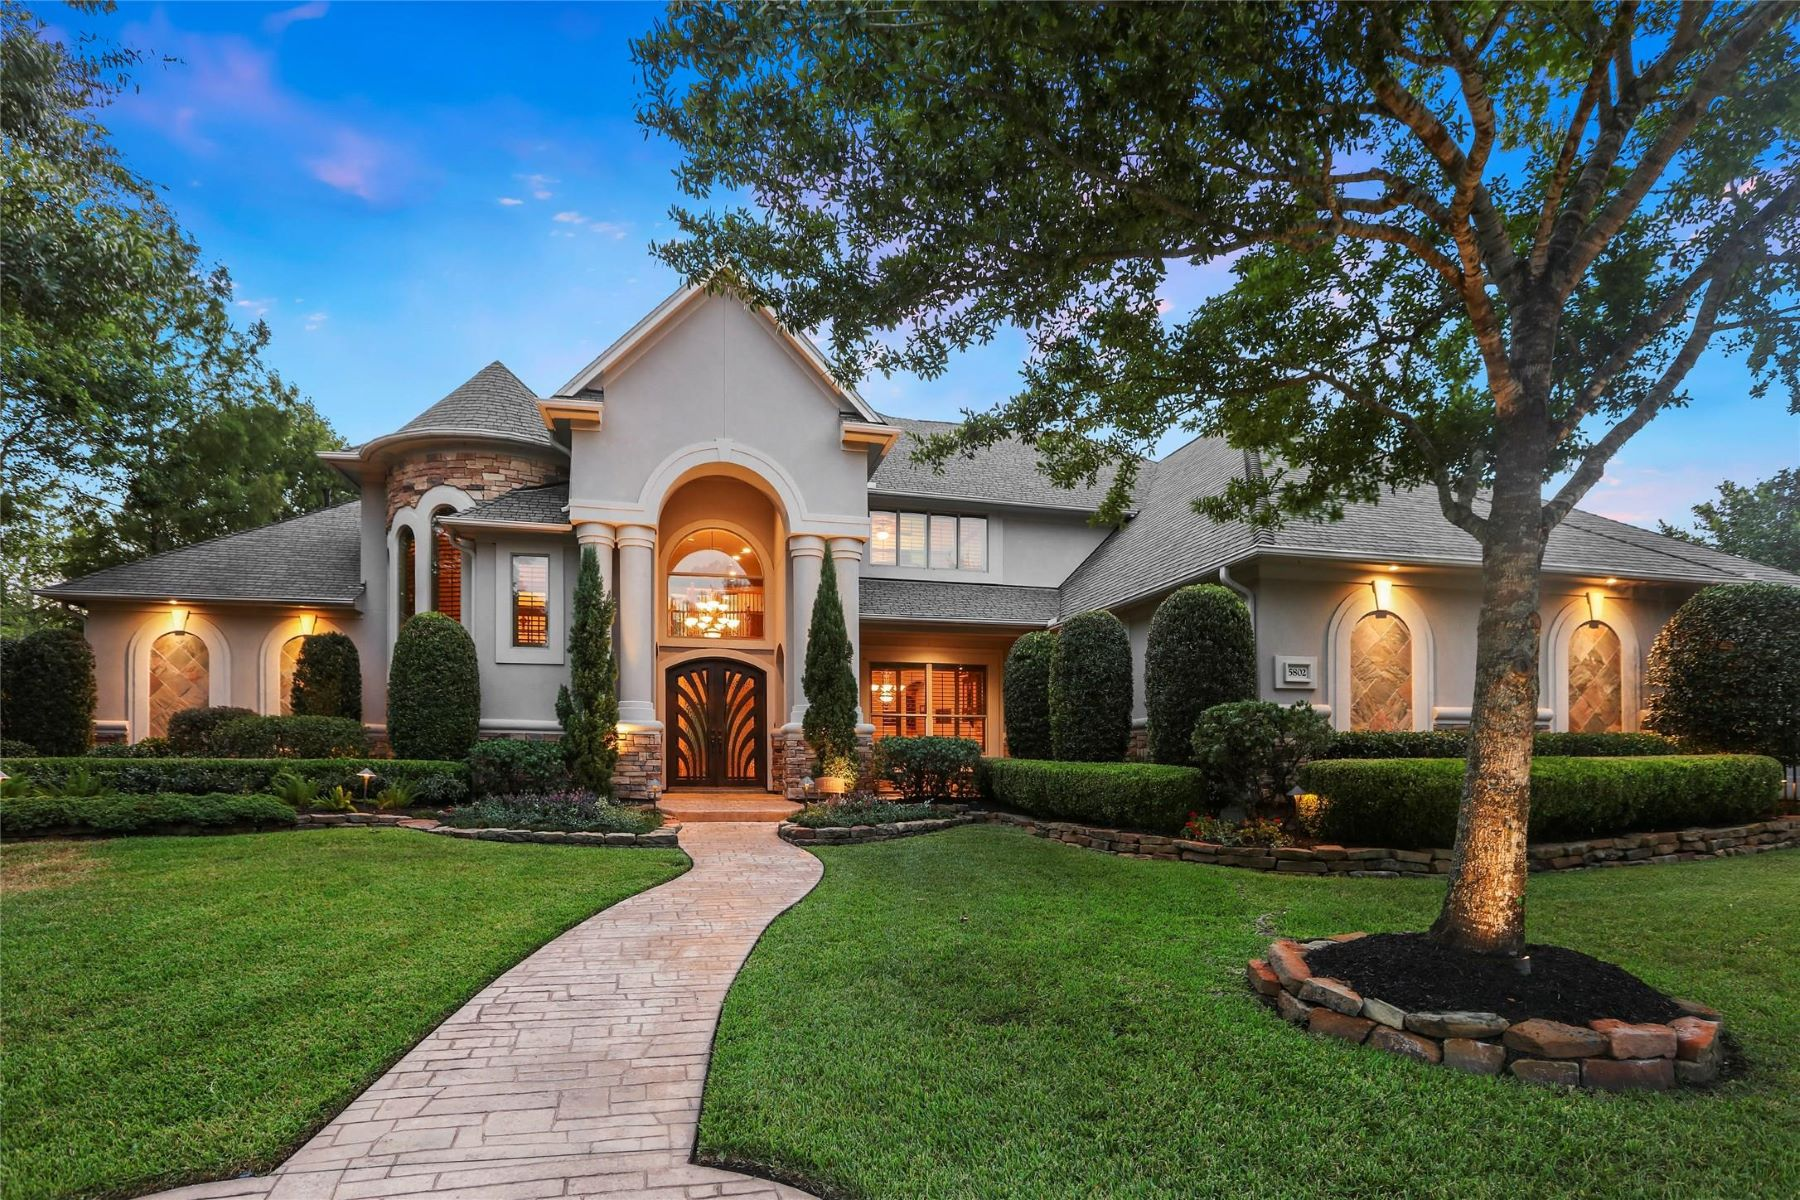 Single Family Homes for Sale at 5802 Blackstone Creek Lane Kingwood, Texas 77345 United States